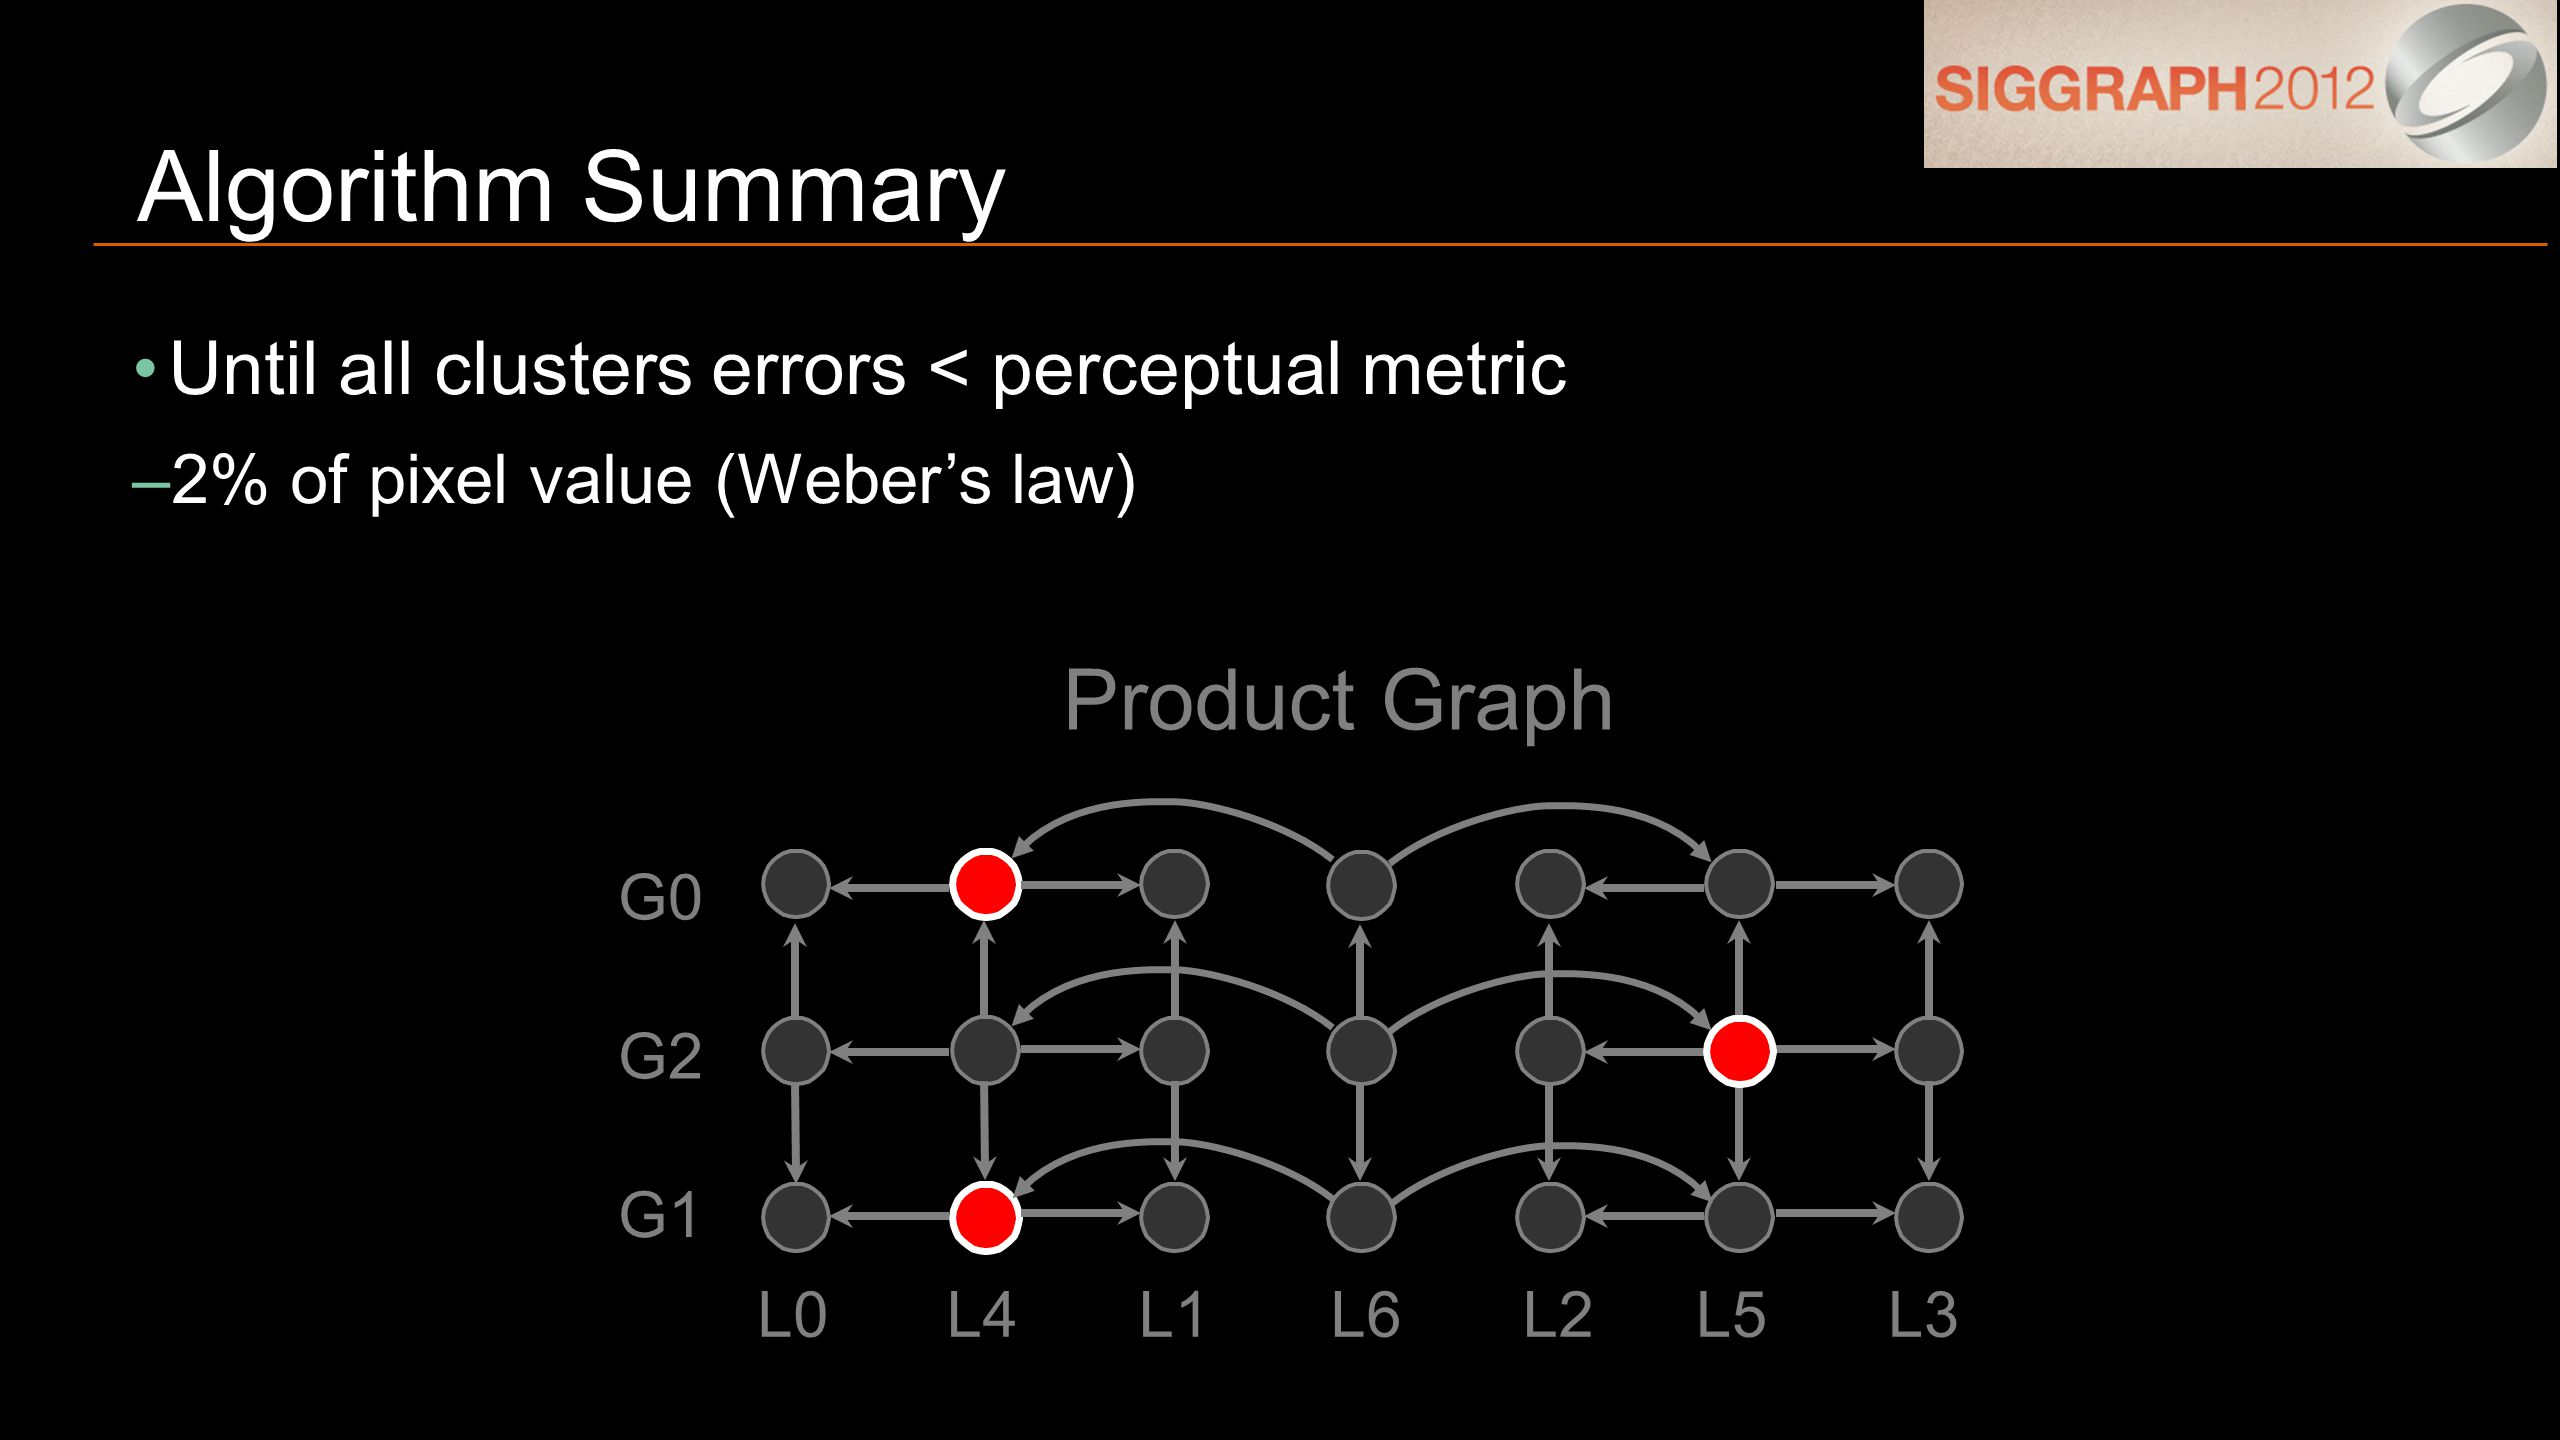 Until all clusters errors < perceptual metric –2% of pixel value (Weber's law) Algorithm Summary G1 G0 G2 L0L4L1L6L2L5L3 Product Graph